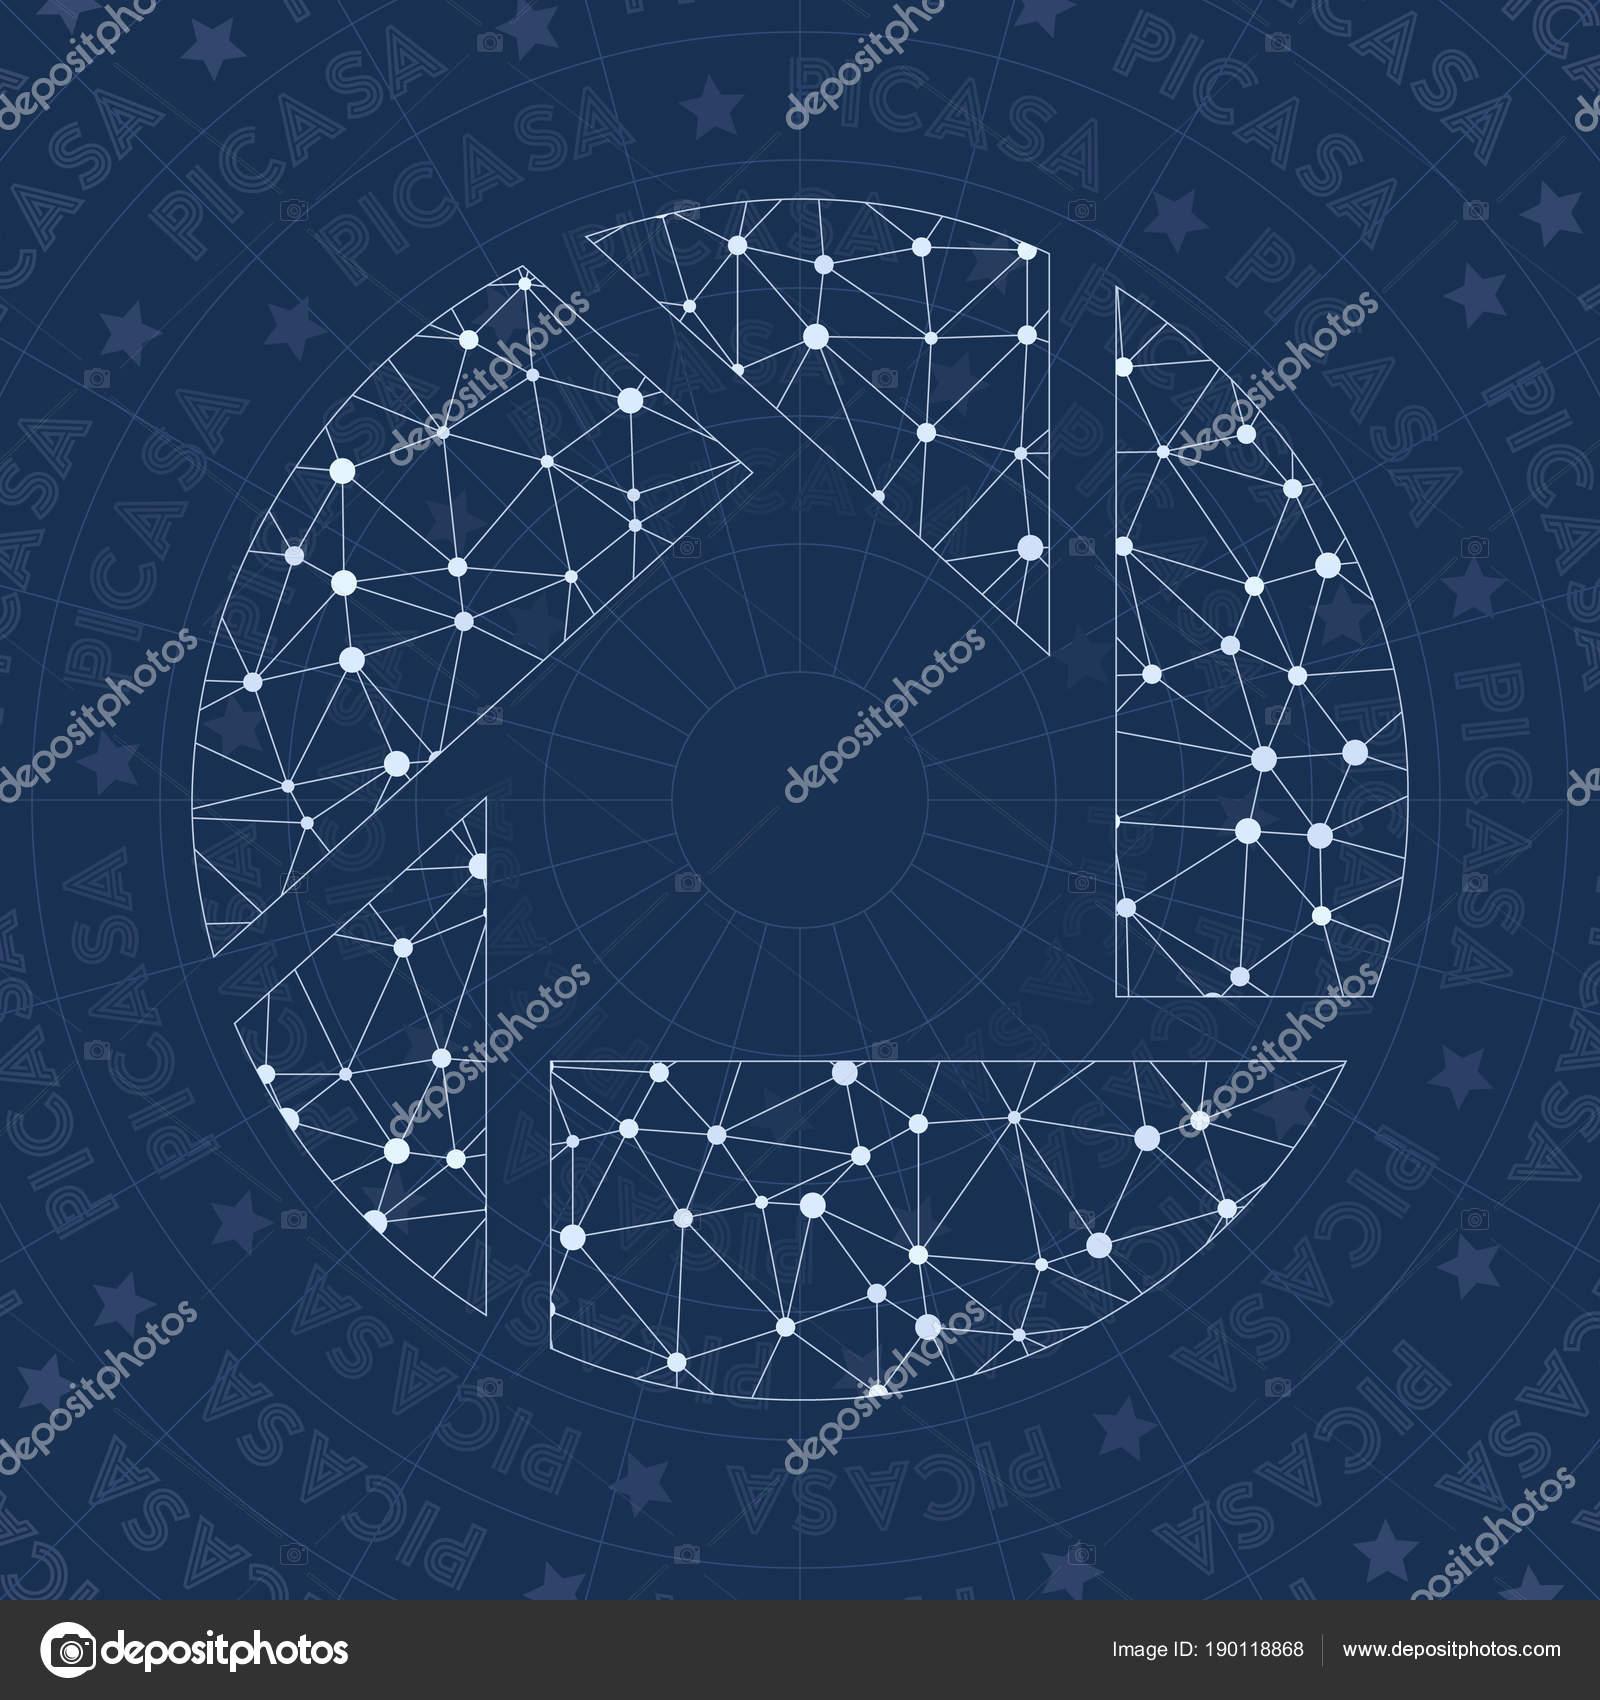 Picasa network symbol Amazing constellation style symbol